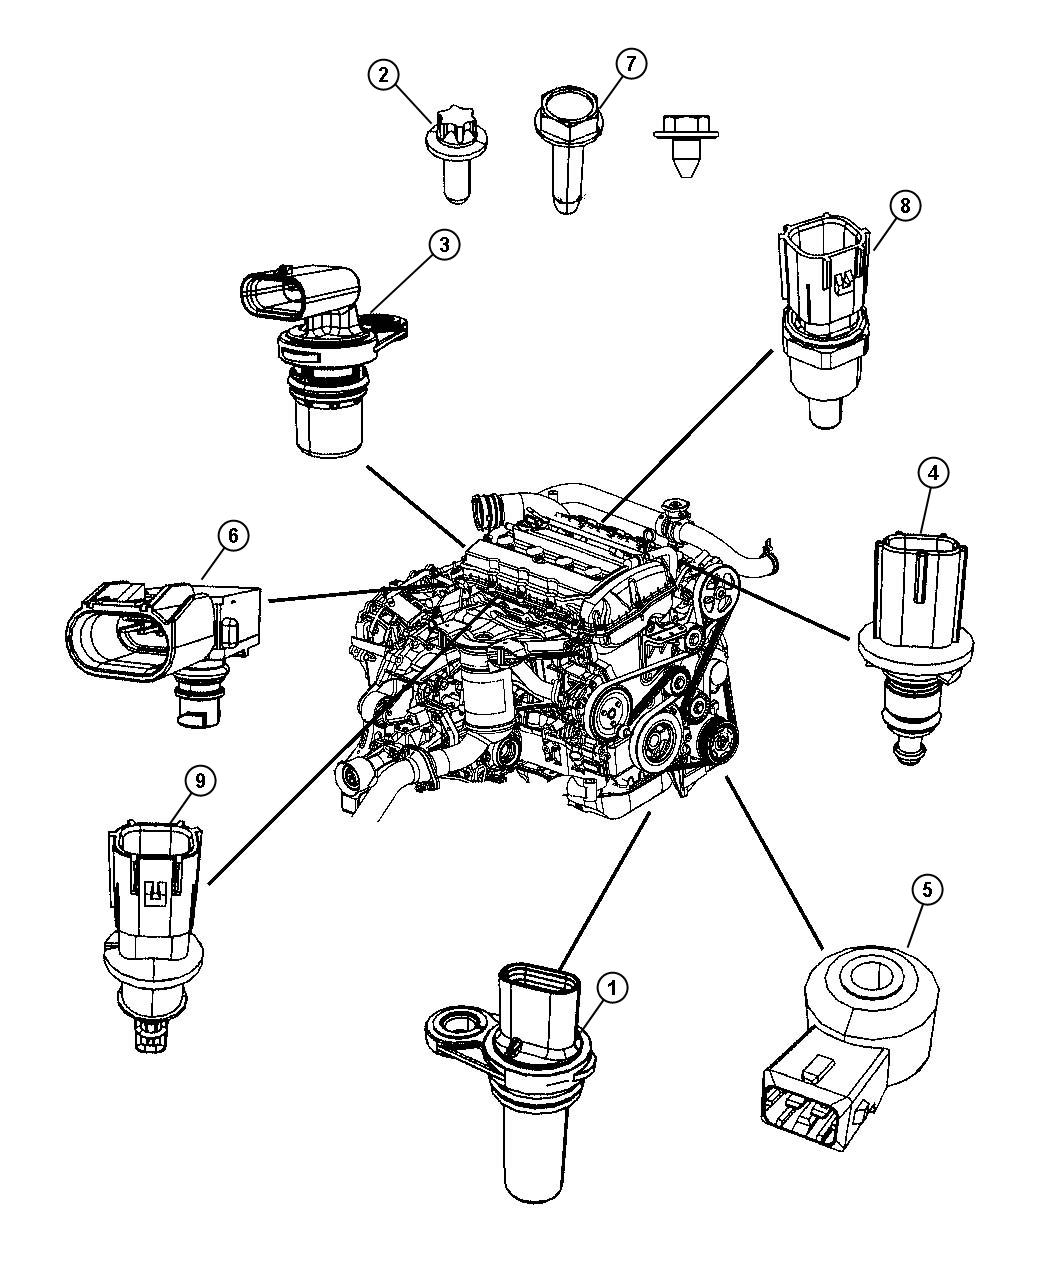 2012 Jeep Compass Sensor. Crankshaft position. Eba, ecn